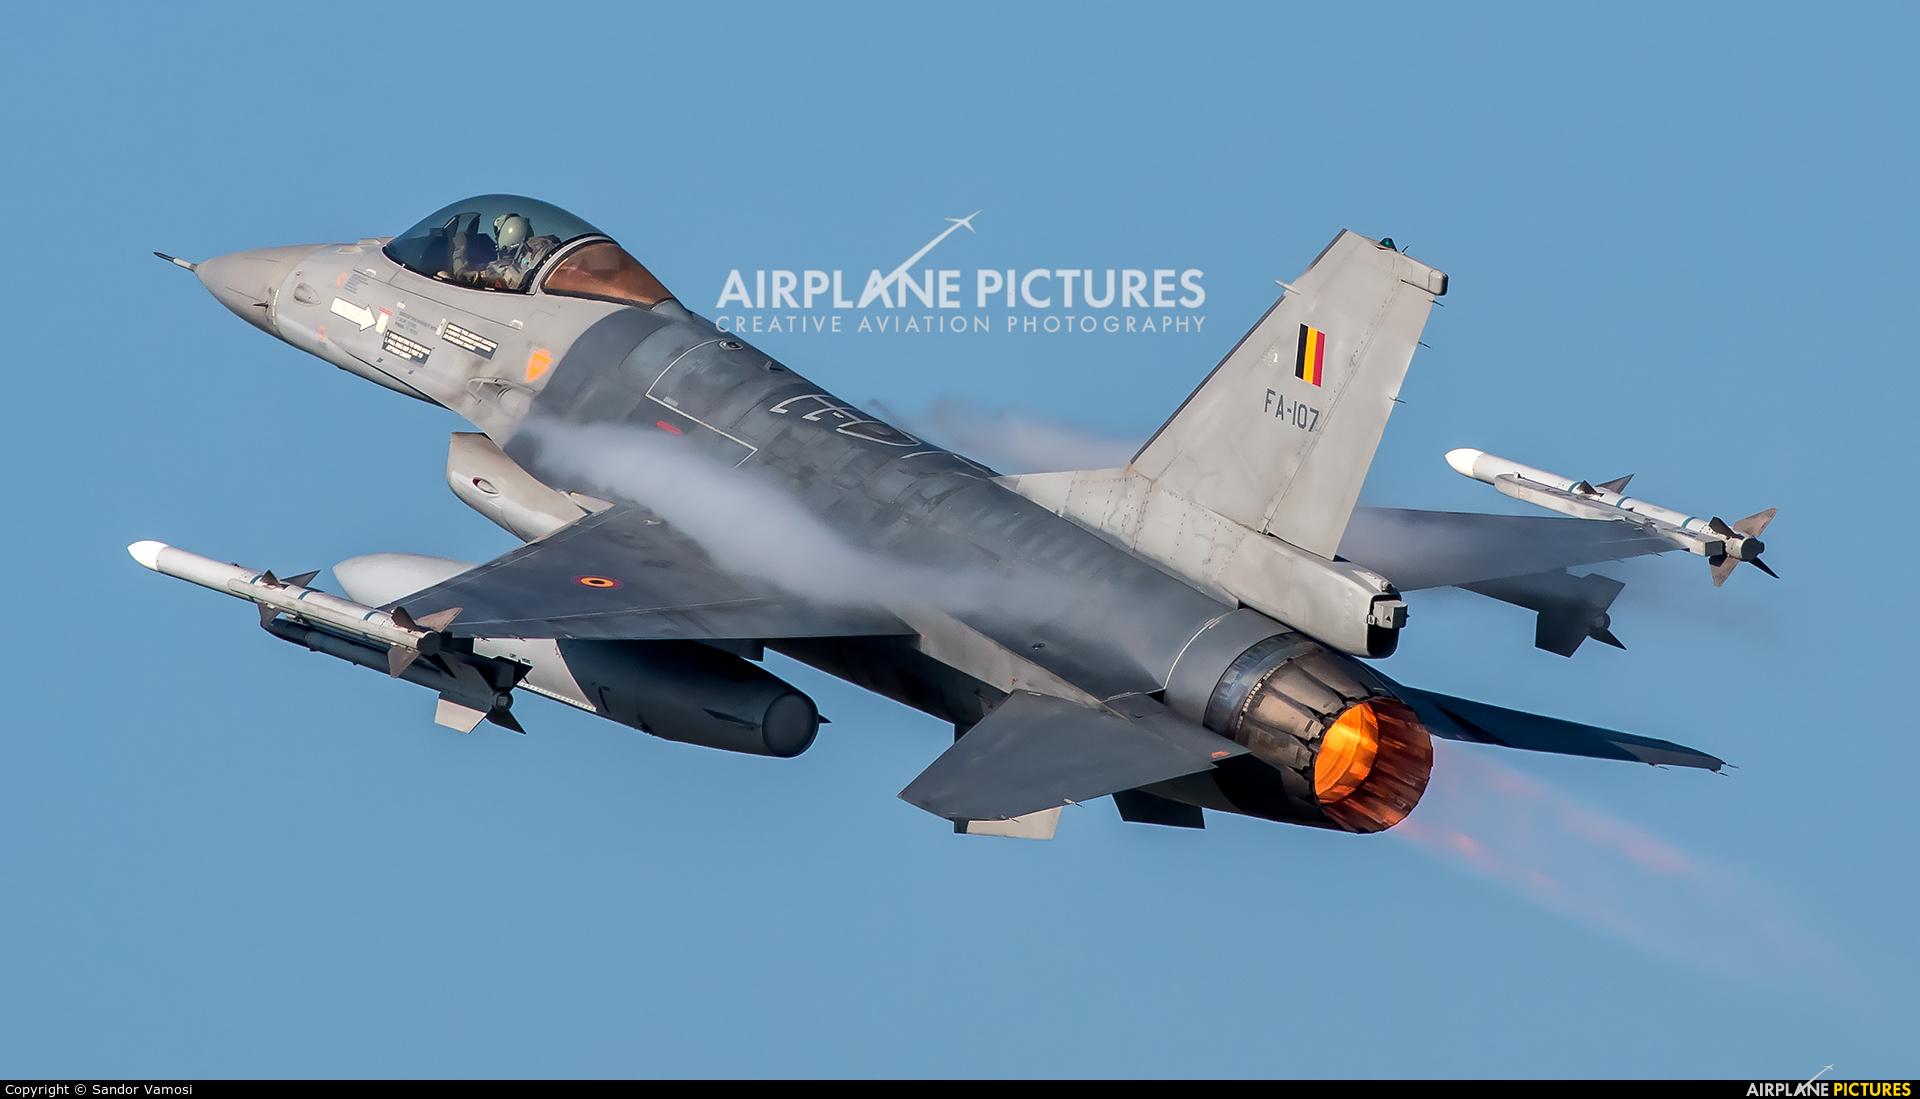 Belgium - Air Force FA-107 aircraft at Kleine Brogel